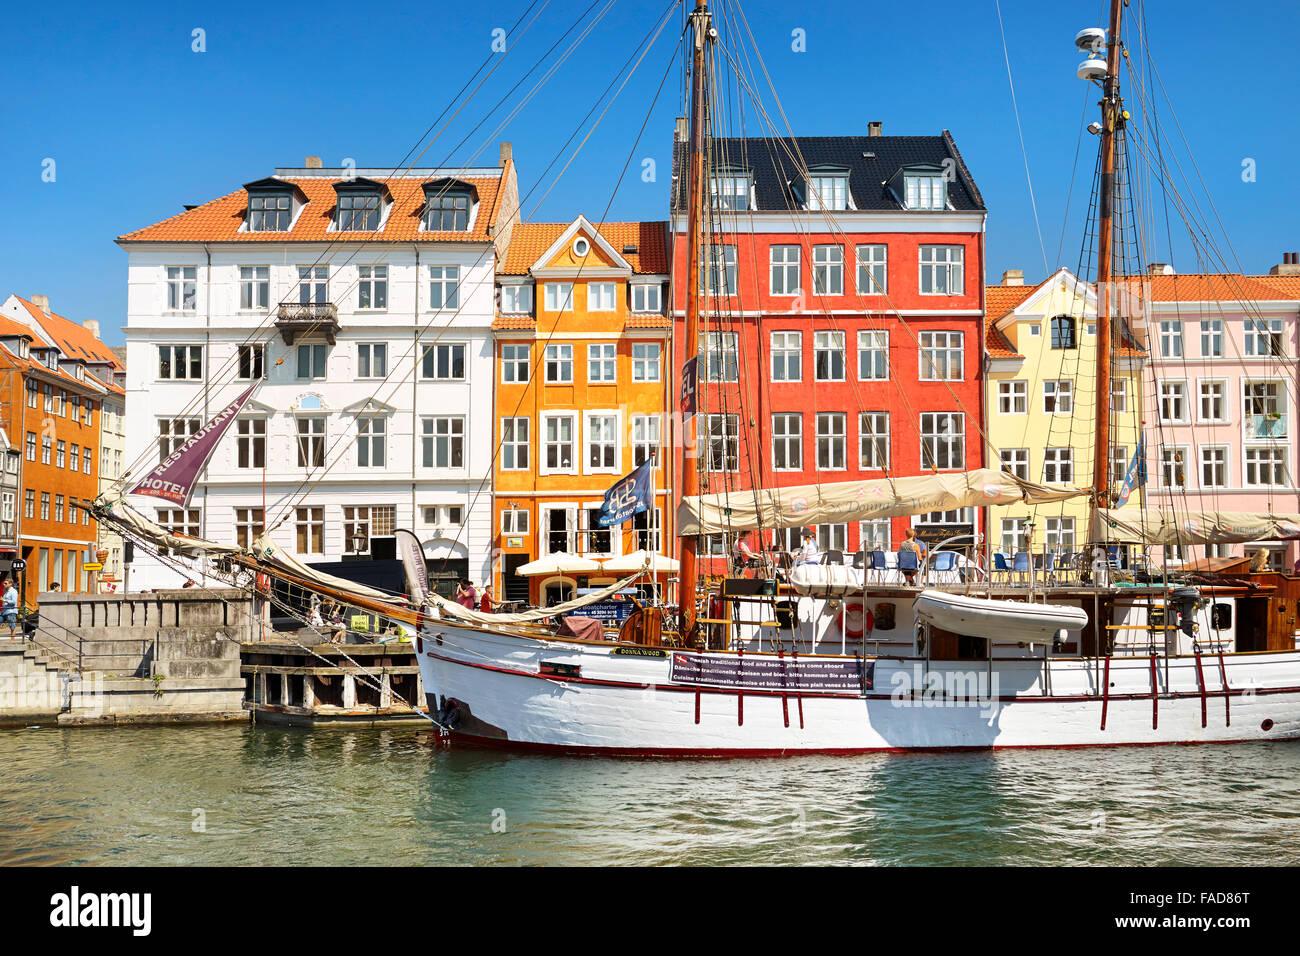 El barco en el Canal de Nyhavn, Copenhague, Dinamarca Foto de stock